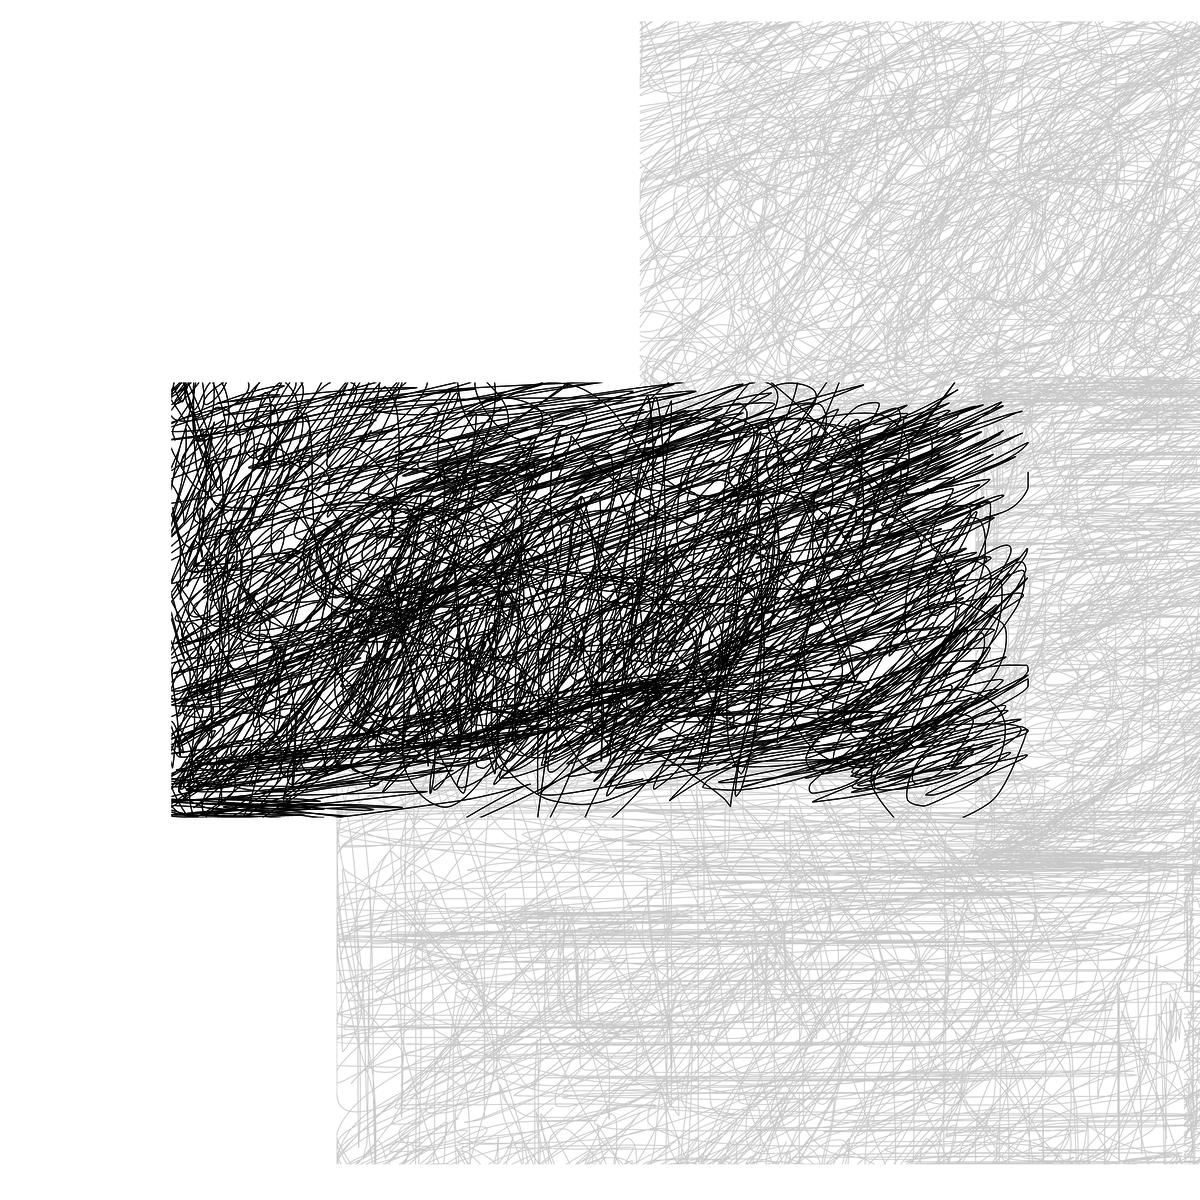 BAAAM drawing#23375 lat:46.5209503173828100lng: 6.6337909698486330